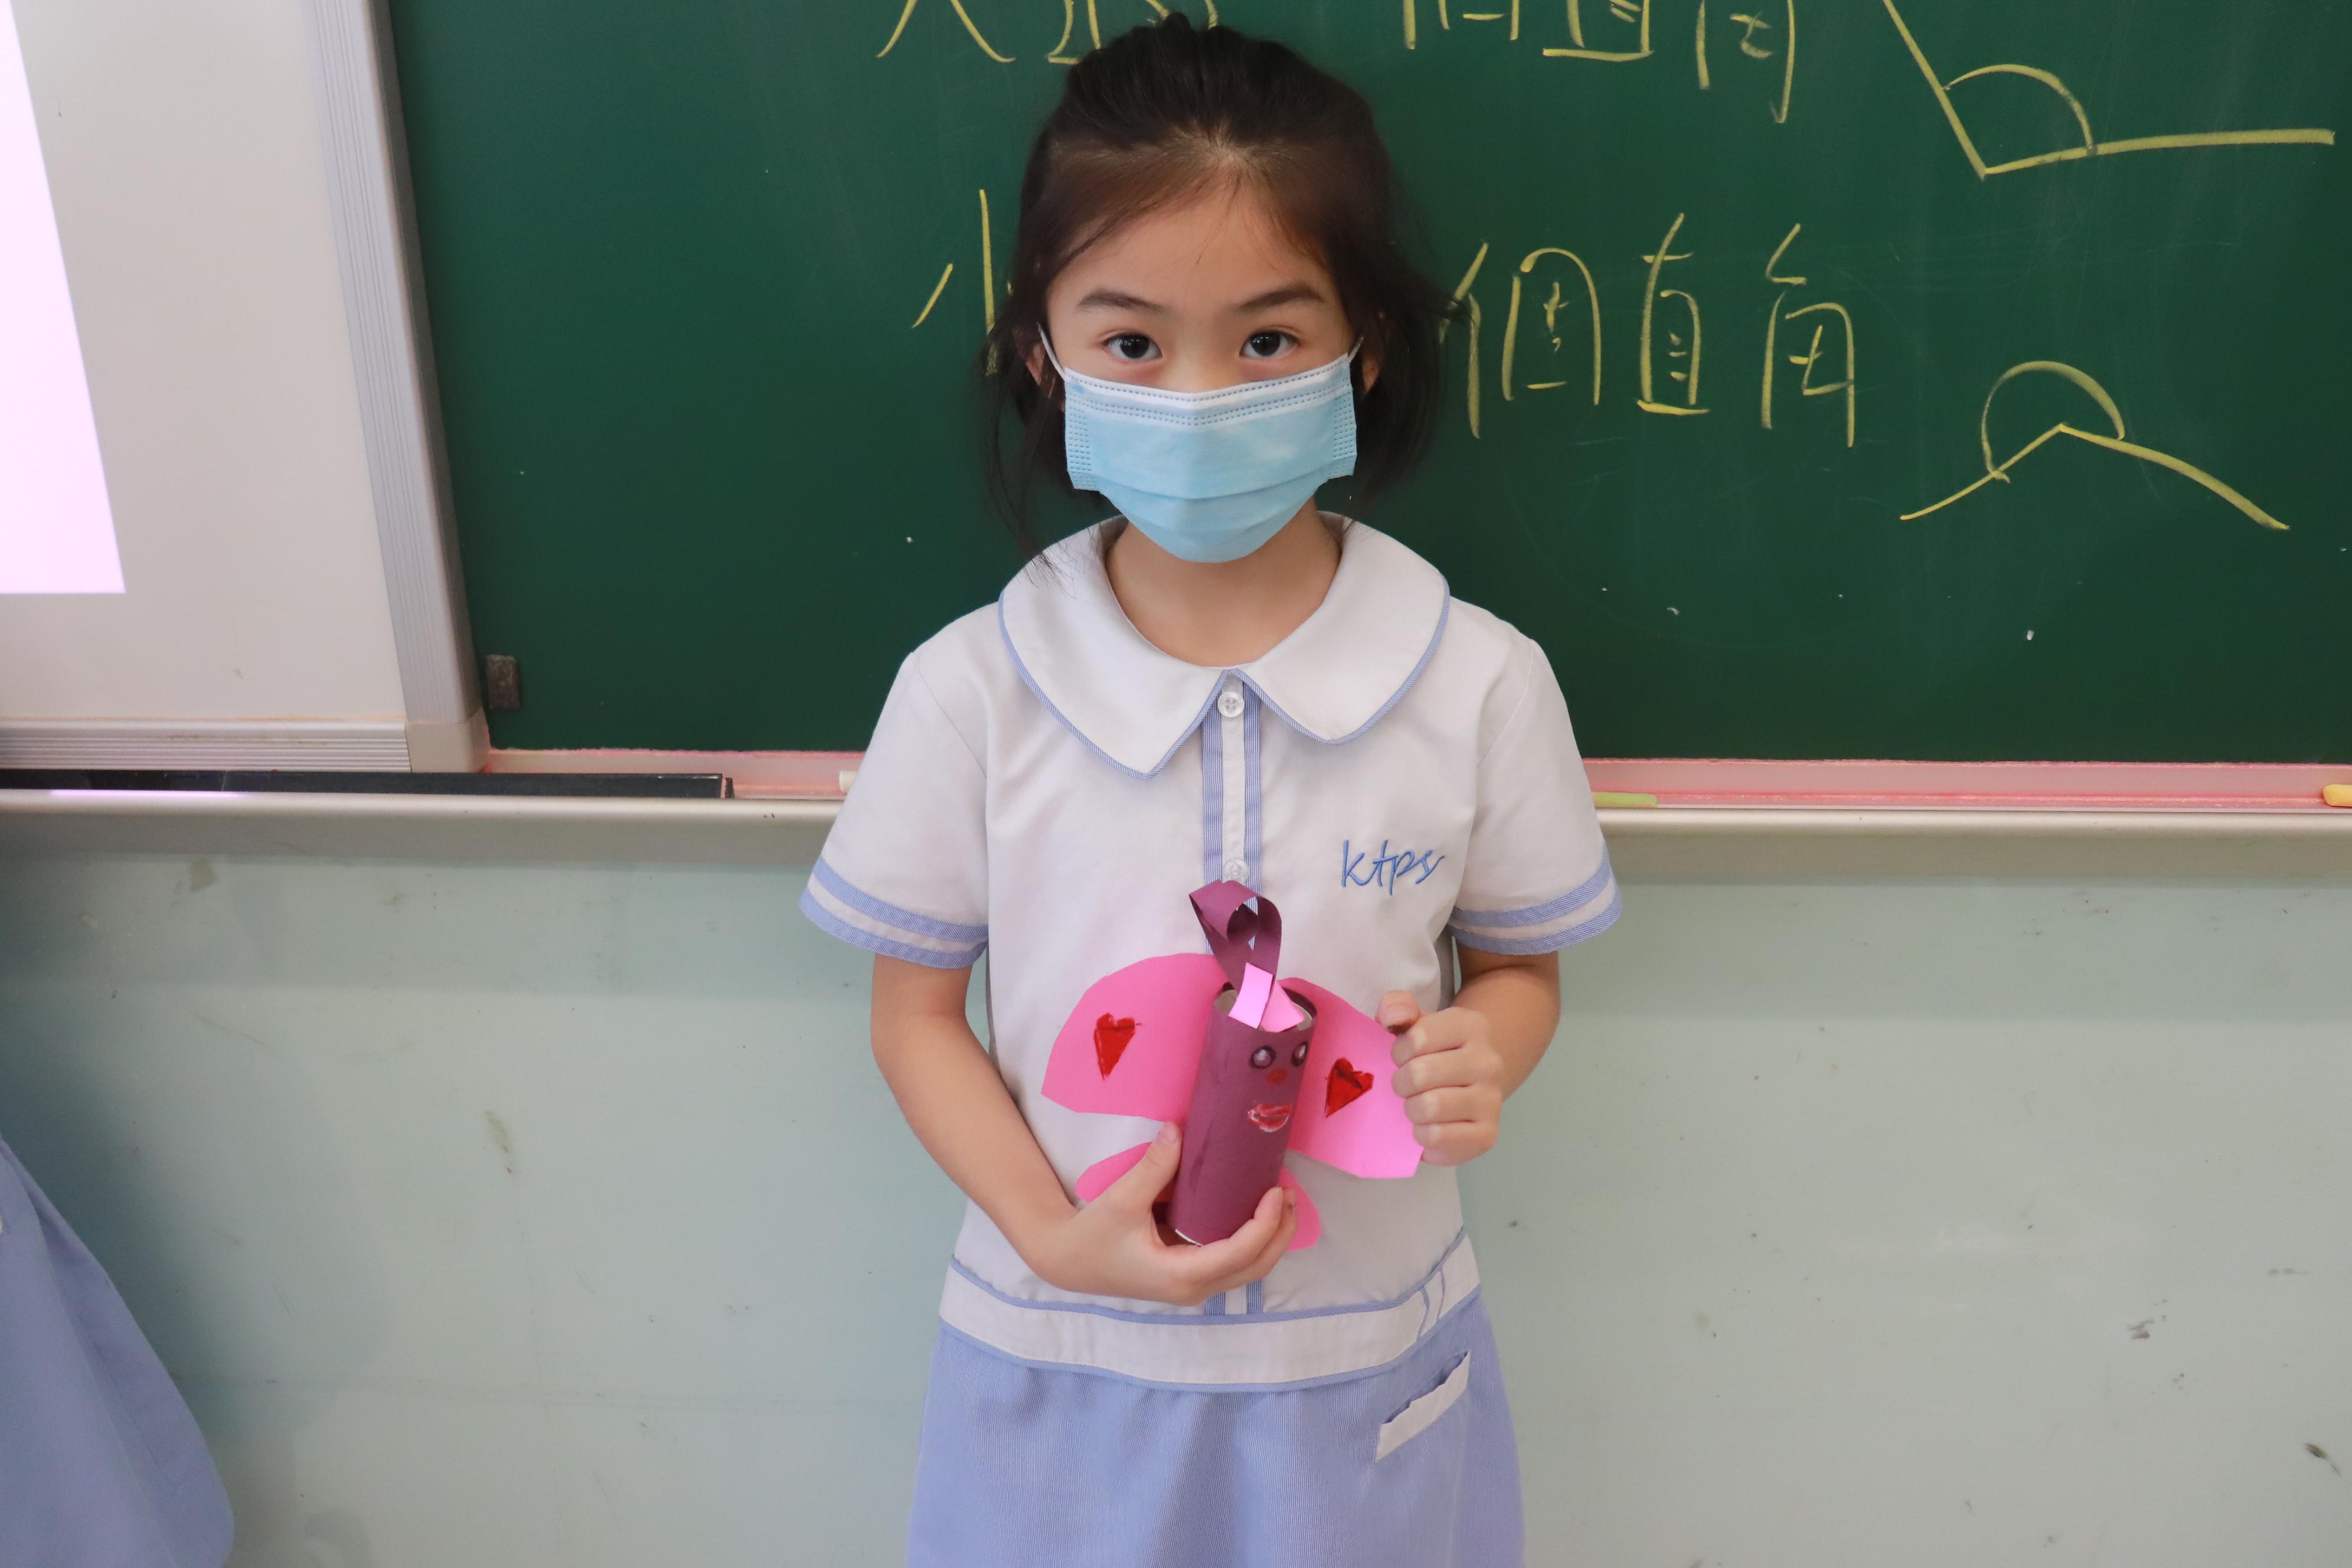 http://keito.school.hk/sites/default/files/img_6790.jpg